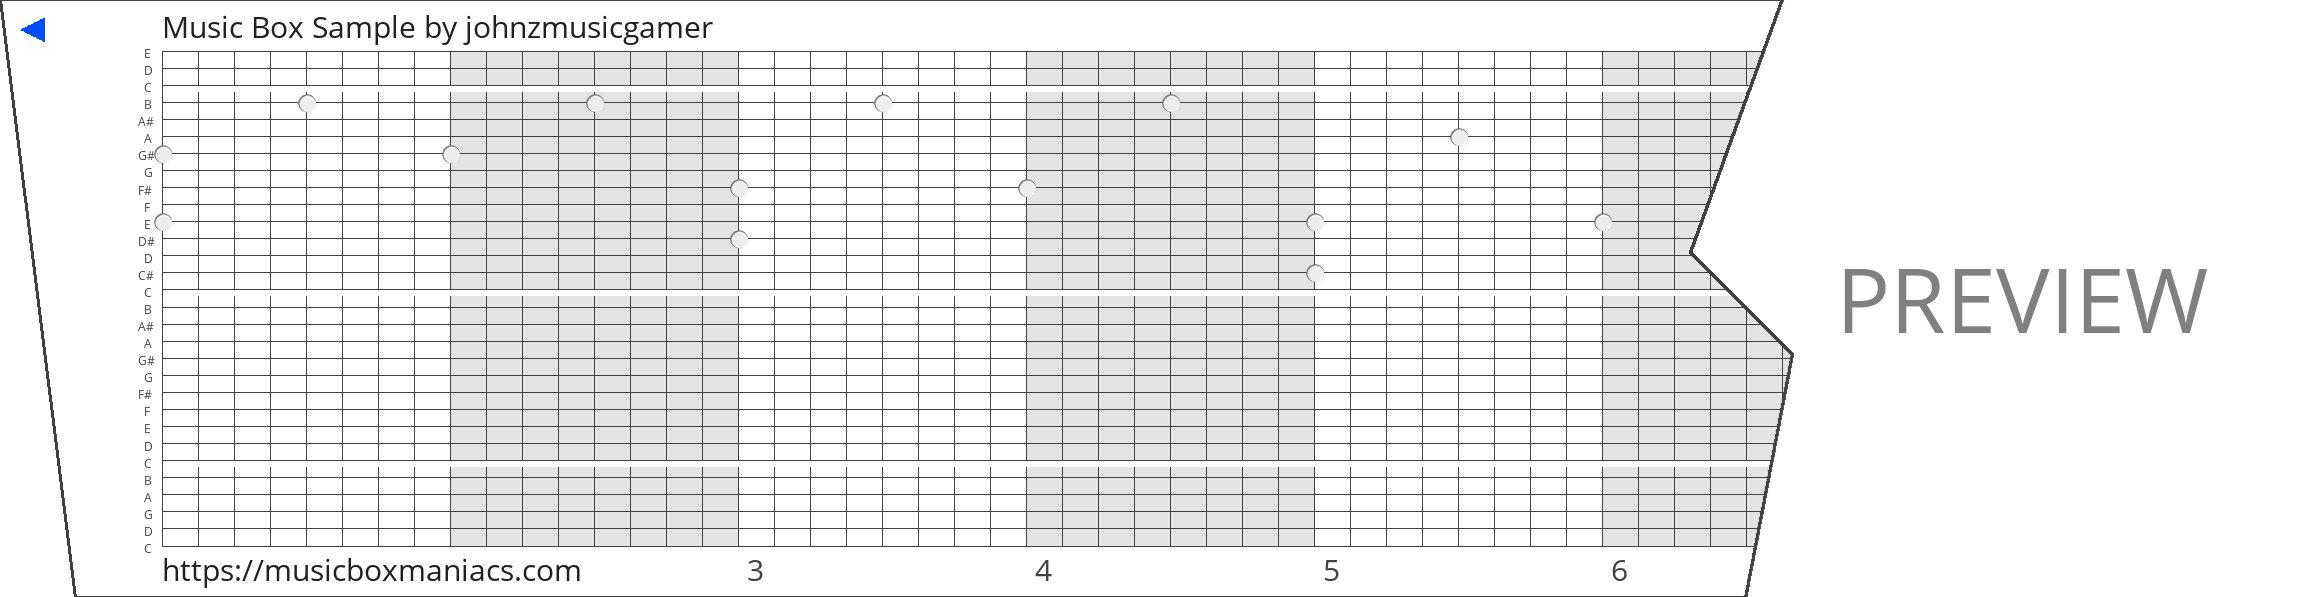 Music Box Sample 30 note music box paper strip